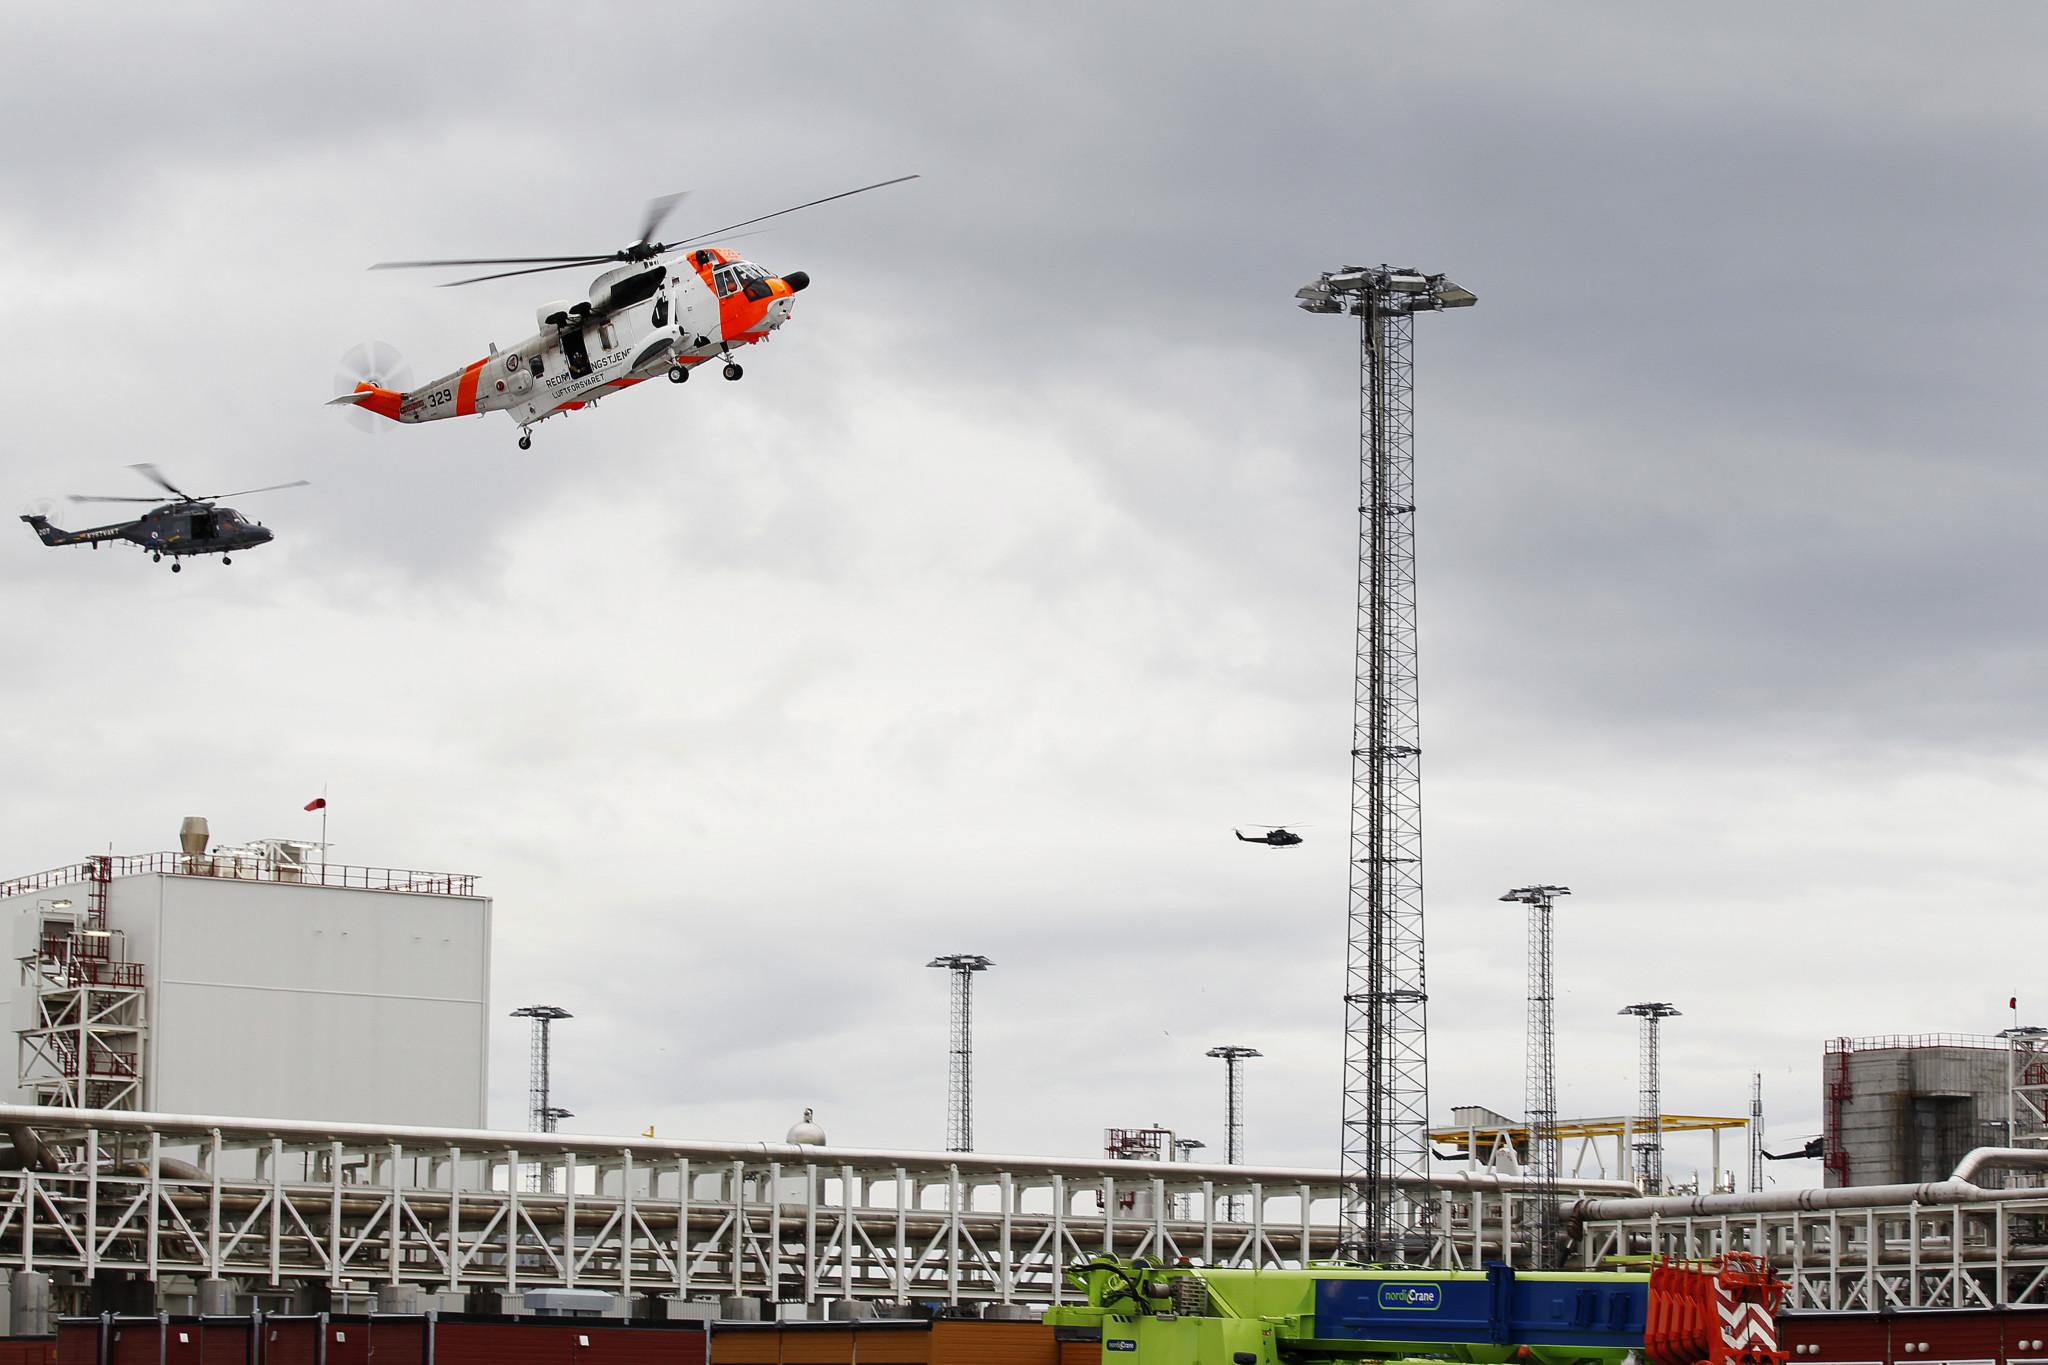 Et Sea King, et Lynx-helikopter og et Bell-412SP-helikopter under Øvelse Gemini 2011 i Hammerfest. Foto: TORBJØRN KJOSVOLD/FORSVARET